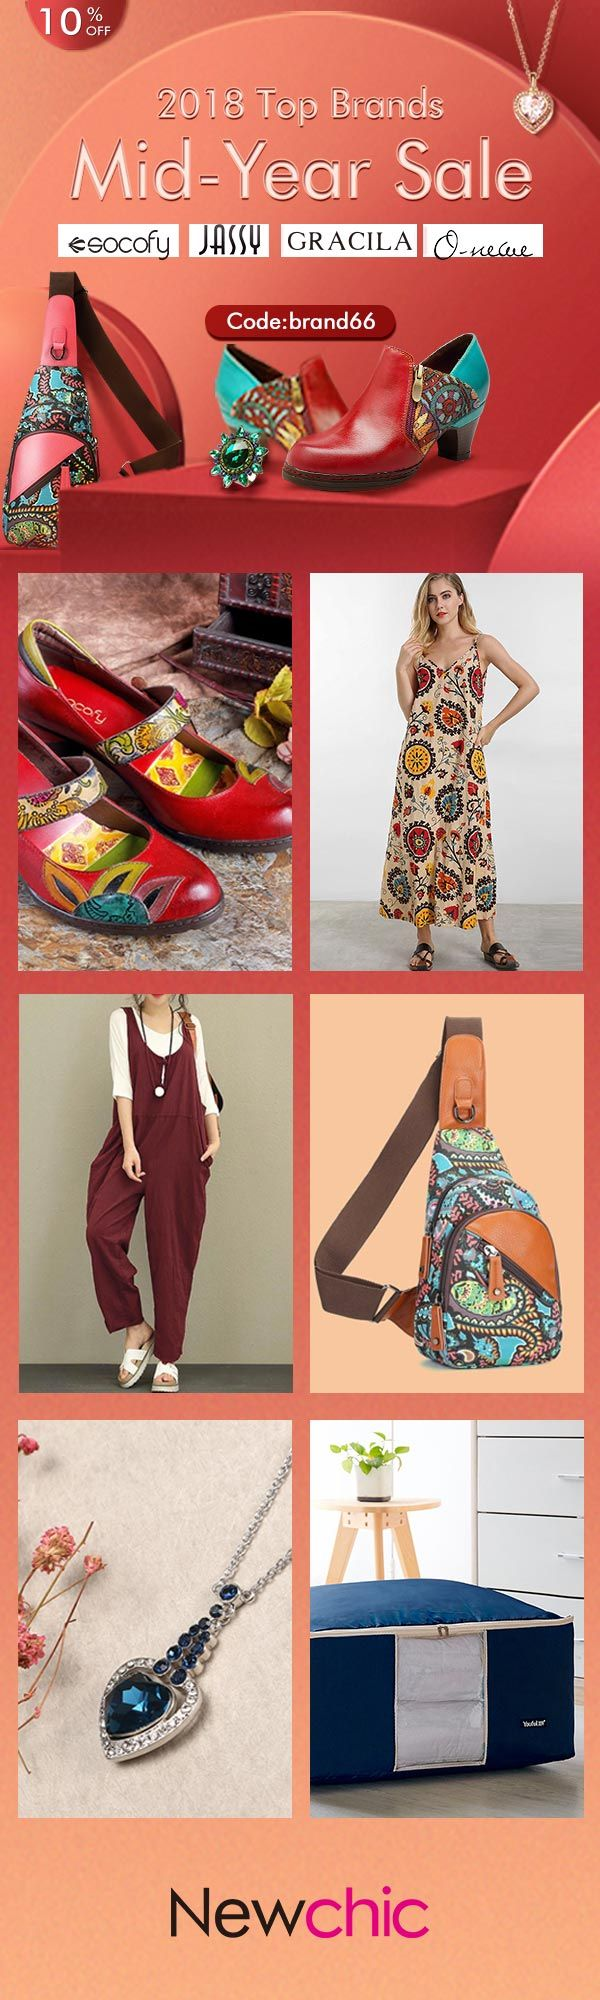 【coupon code : brand66】2018 Top Brands Mid-Year Sale #womenfashion #summeroutfits #fashionover30 #discountshop